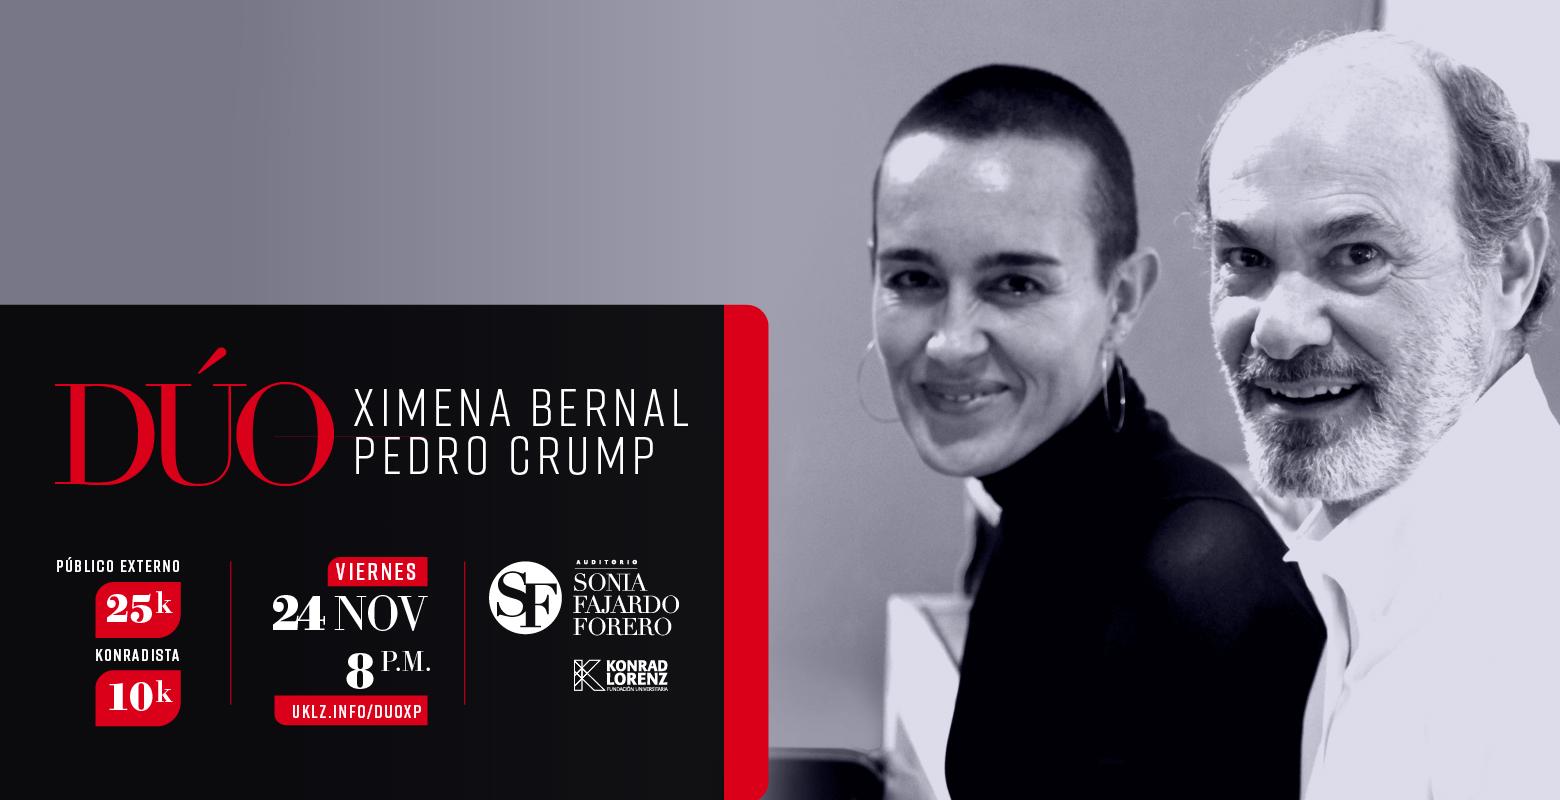 DÚO: Ximena Bernal y Pedro Crump